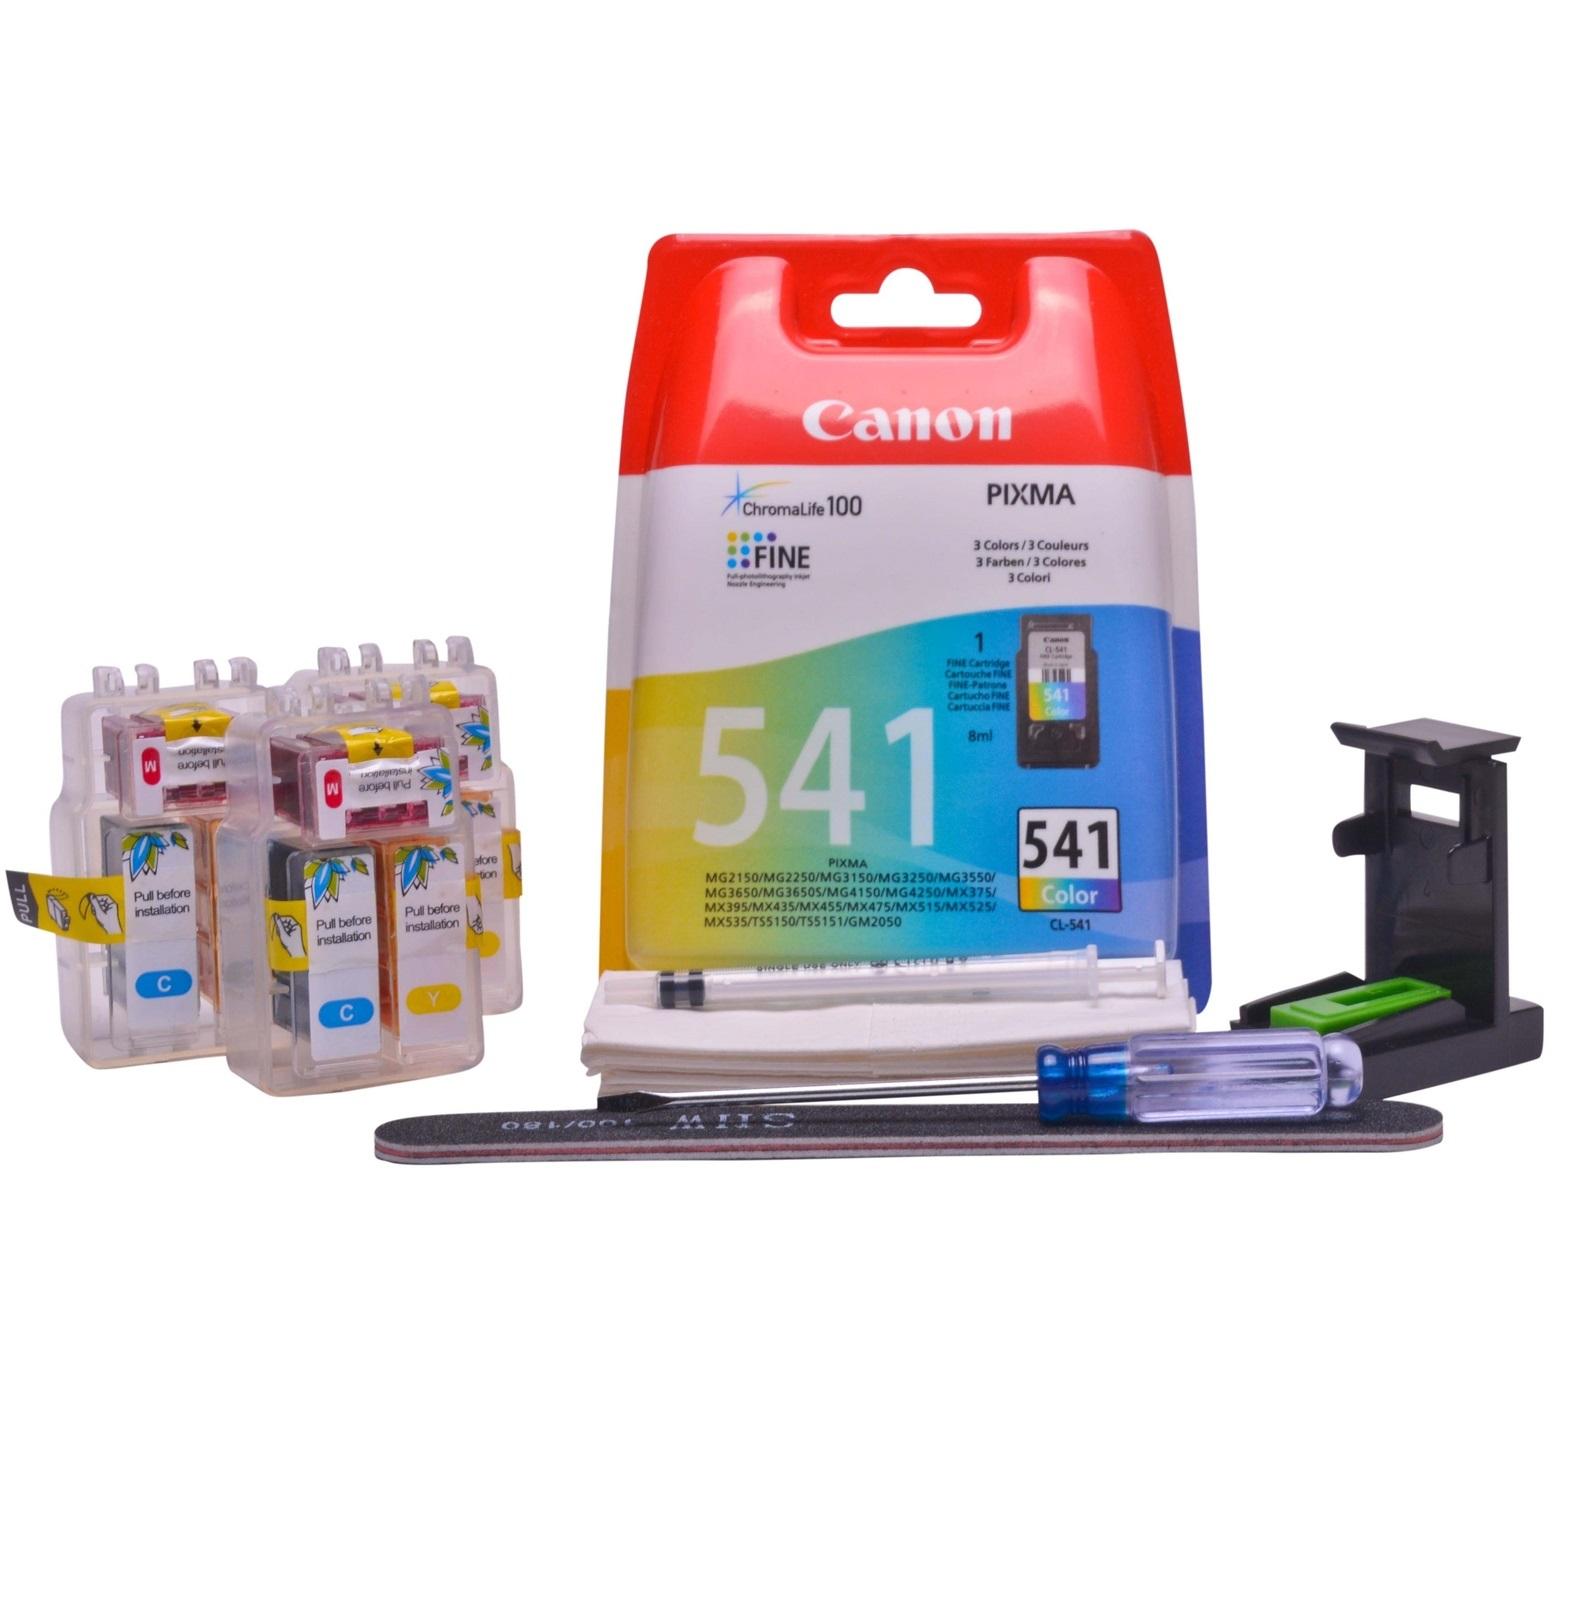 Refillable CL-541XL Colour Pod Cheap printer cartridges for Canon Pixma MG3155 CL-541 dye ink